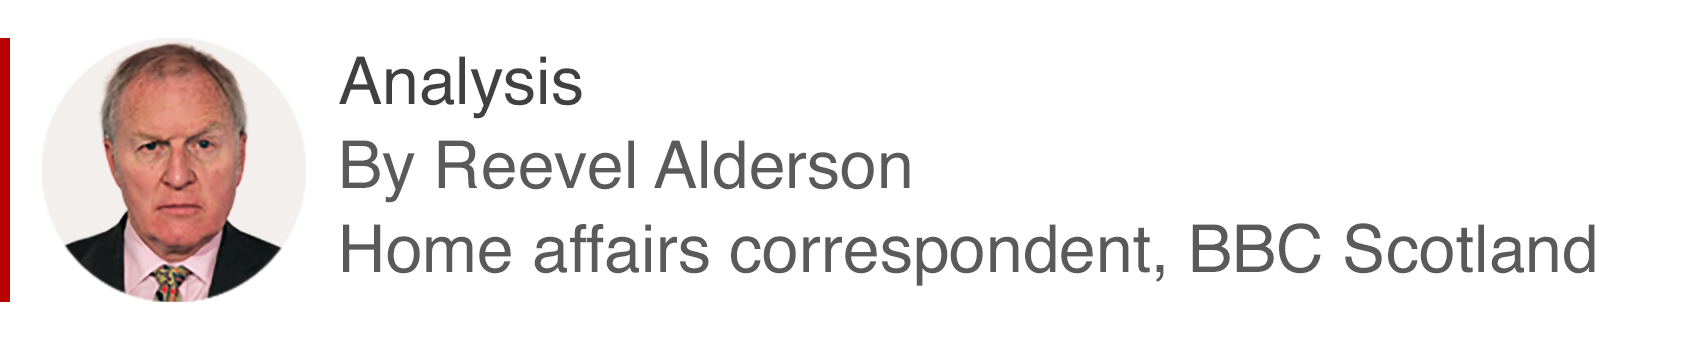 Analysis box by Reevel Alderson, home affairs correspondent